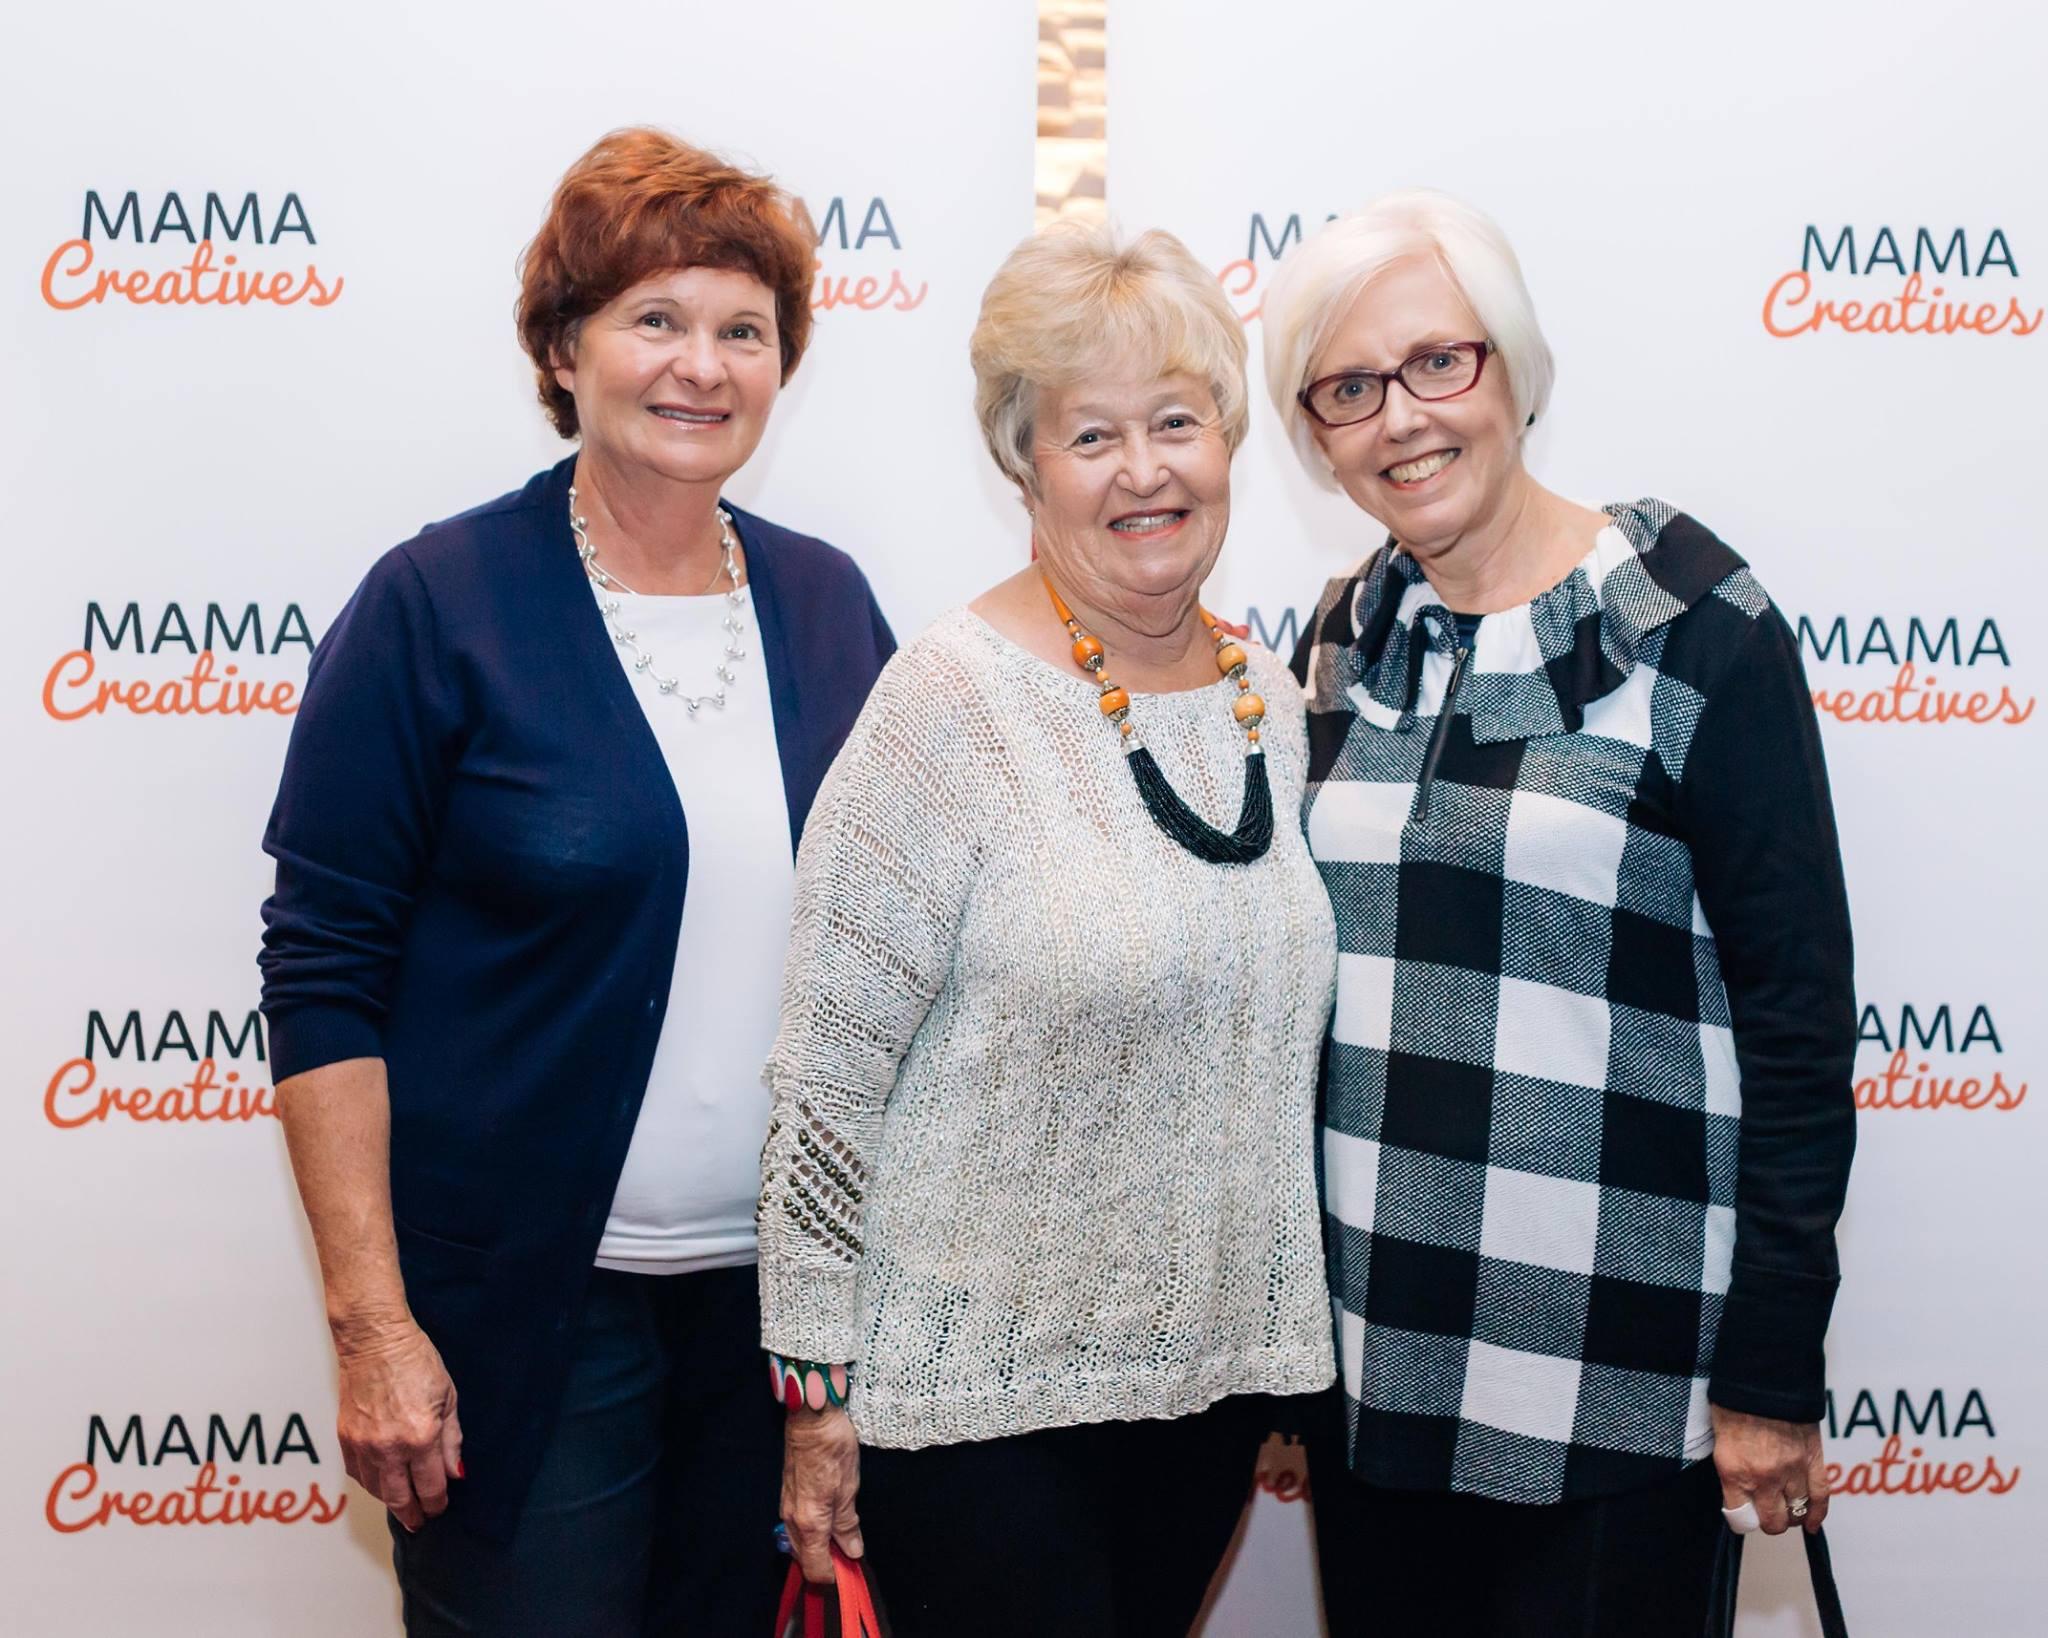 Three fabulous mamas who enjoyed our inspiring Mama Creatives Mother's Day Celebration.